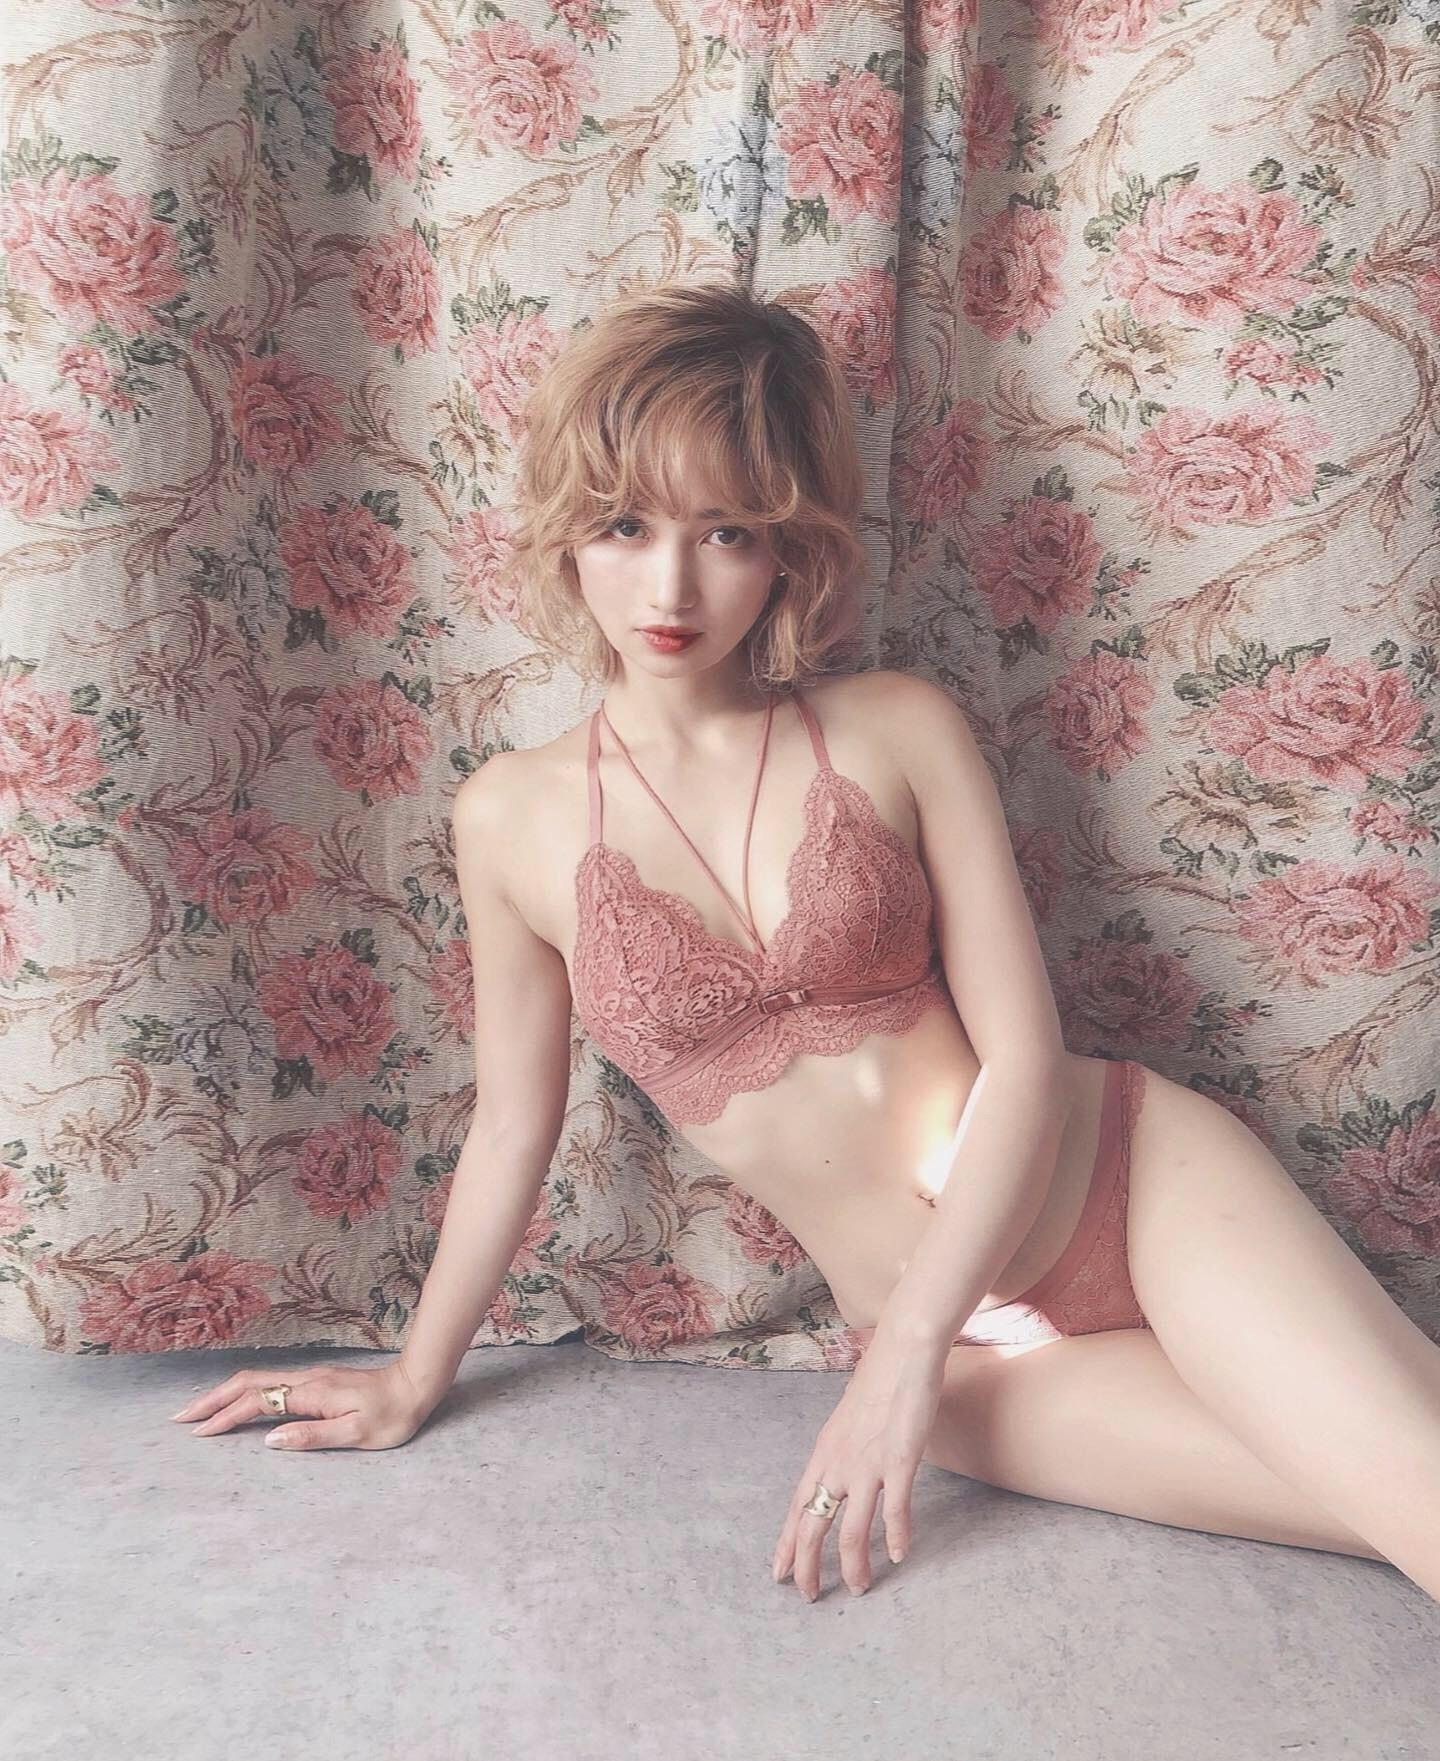 lady lingerie bra&shorts Set